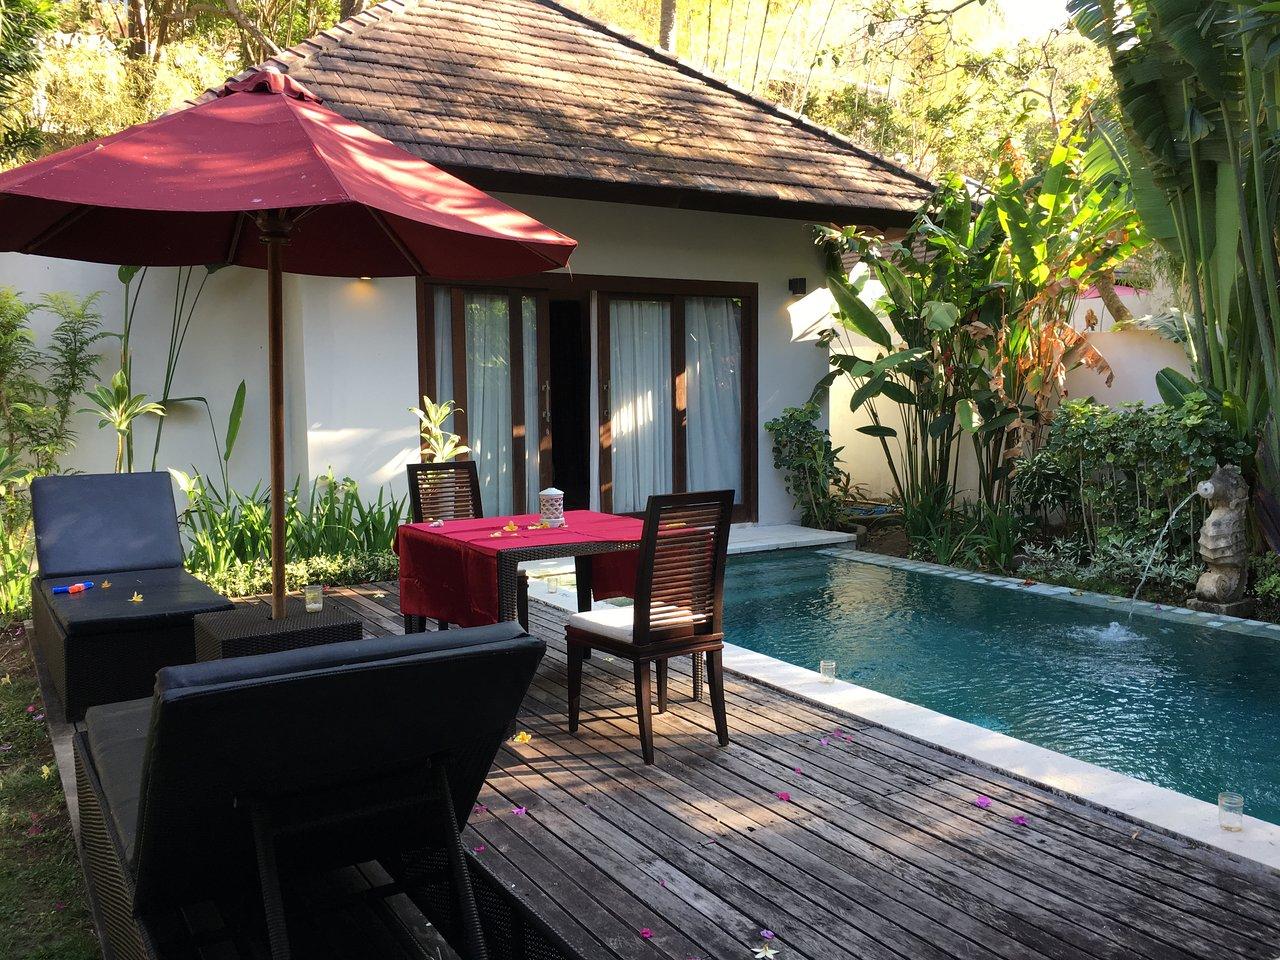 kebun villas resort 33 4 8 prices hotel reviews lombok rh tripadvisor com